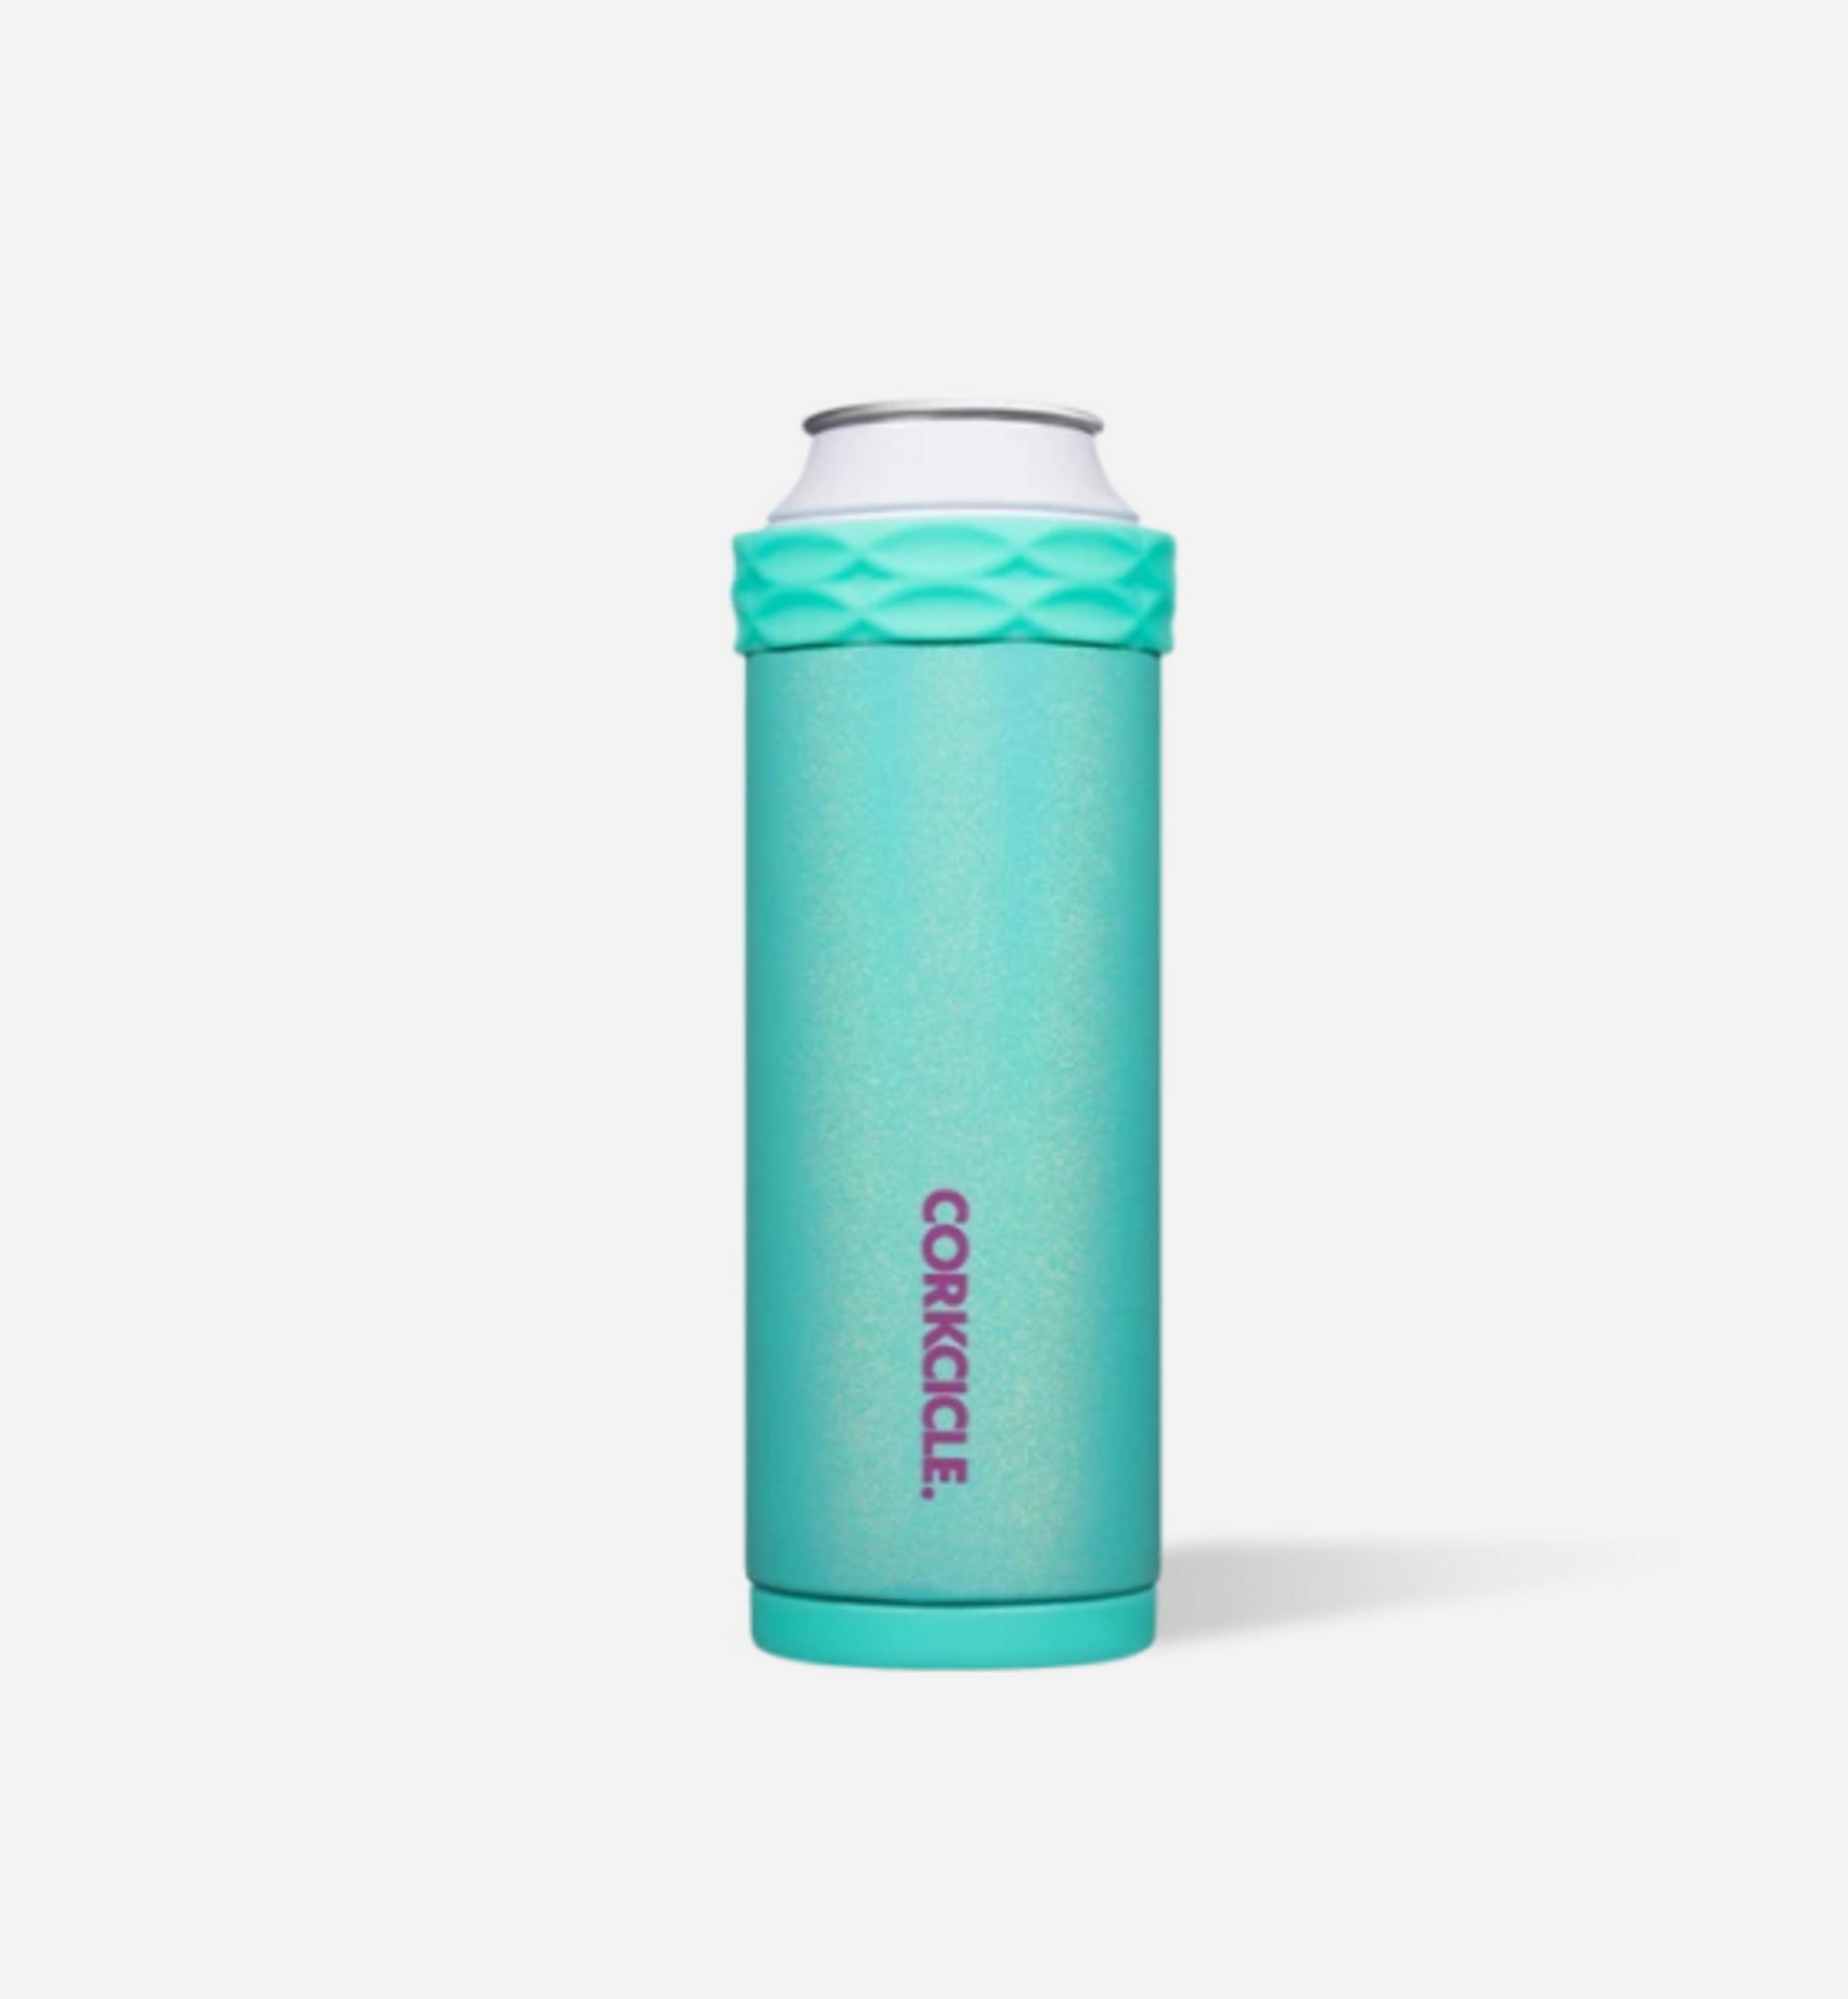 Corkcicle Slim Can Cooler - Sparkle Mermaid